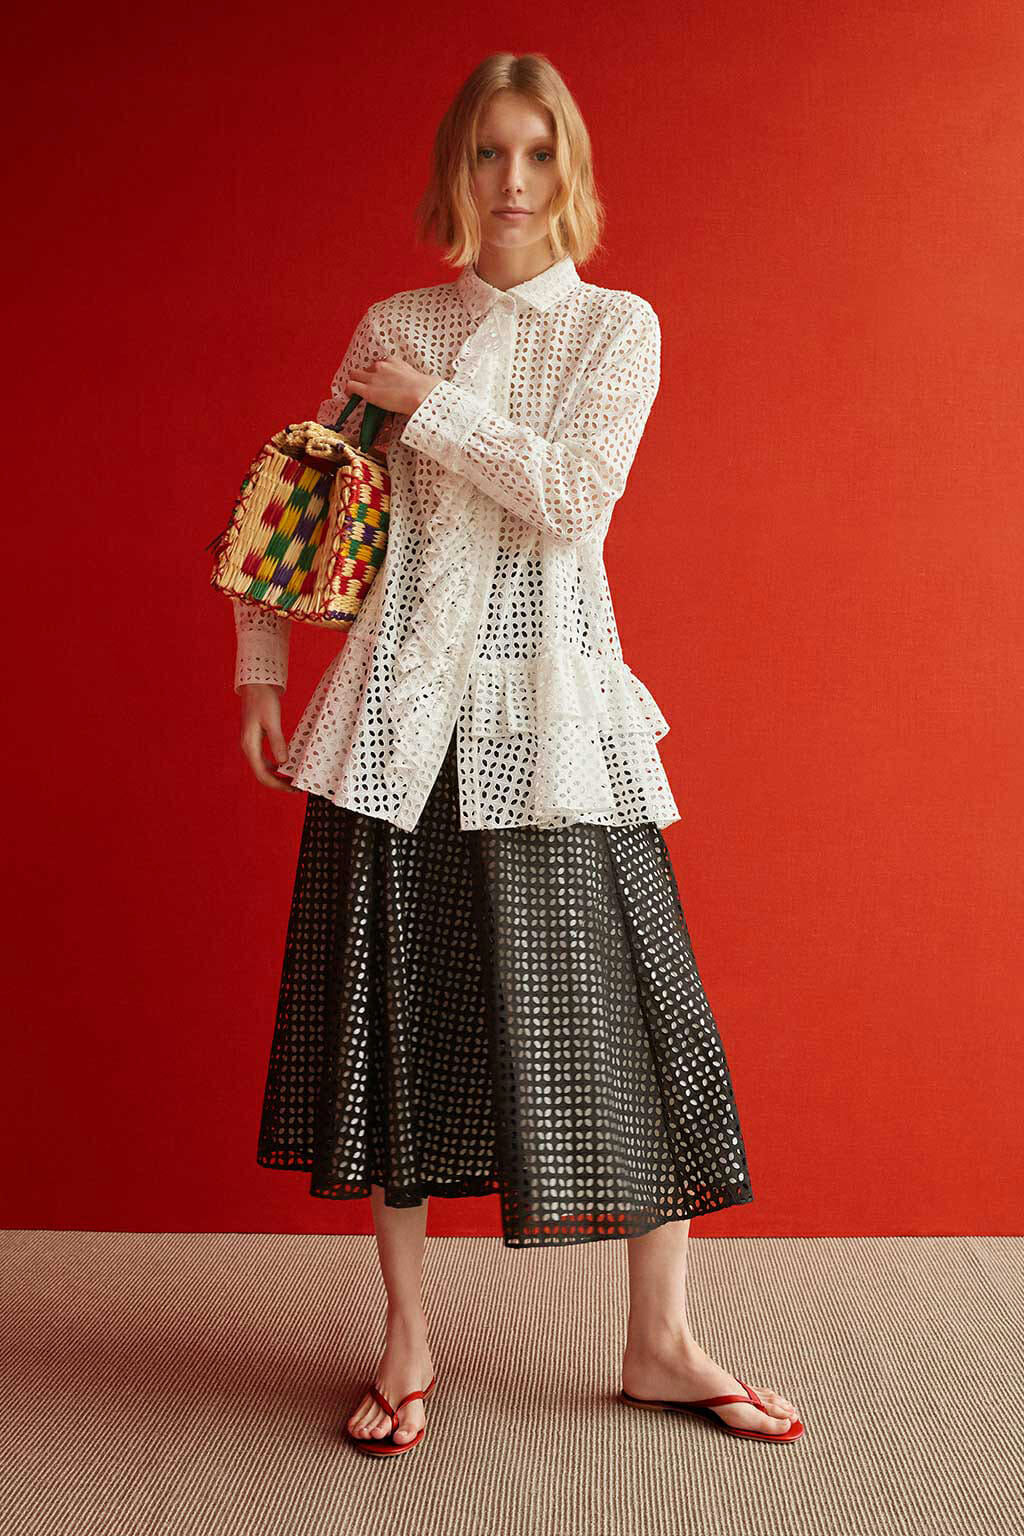 CH Carolina Herrera. New Womenswear Collection Summer. Look 13